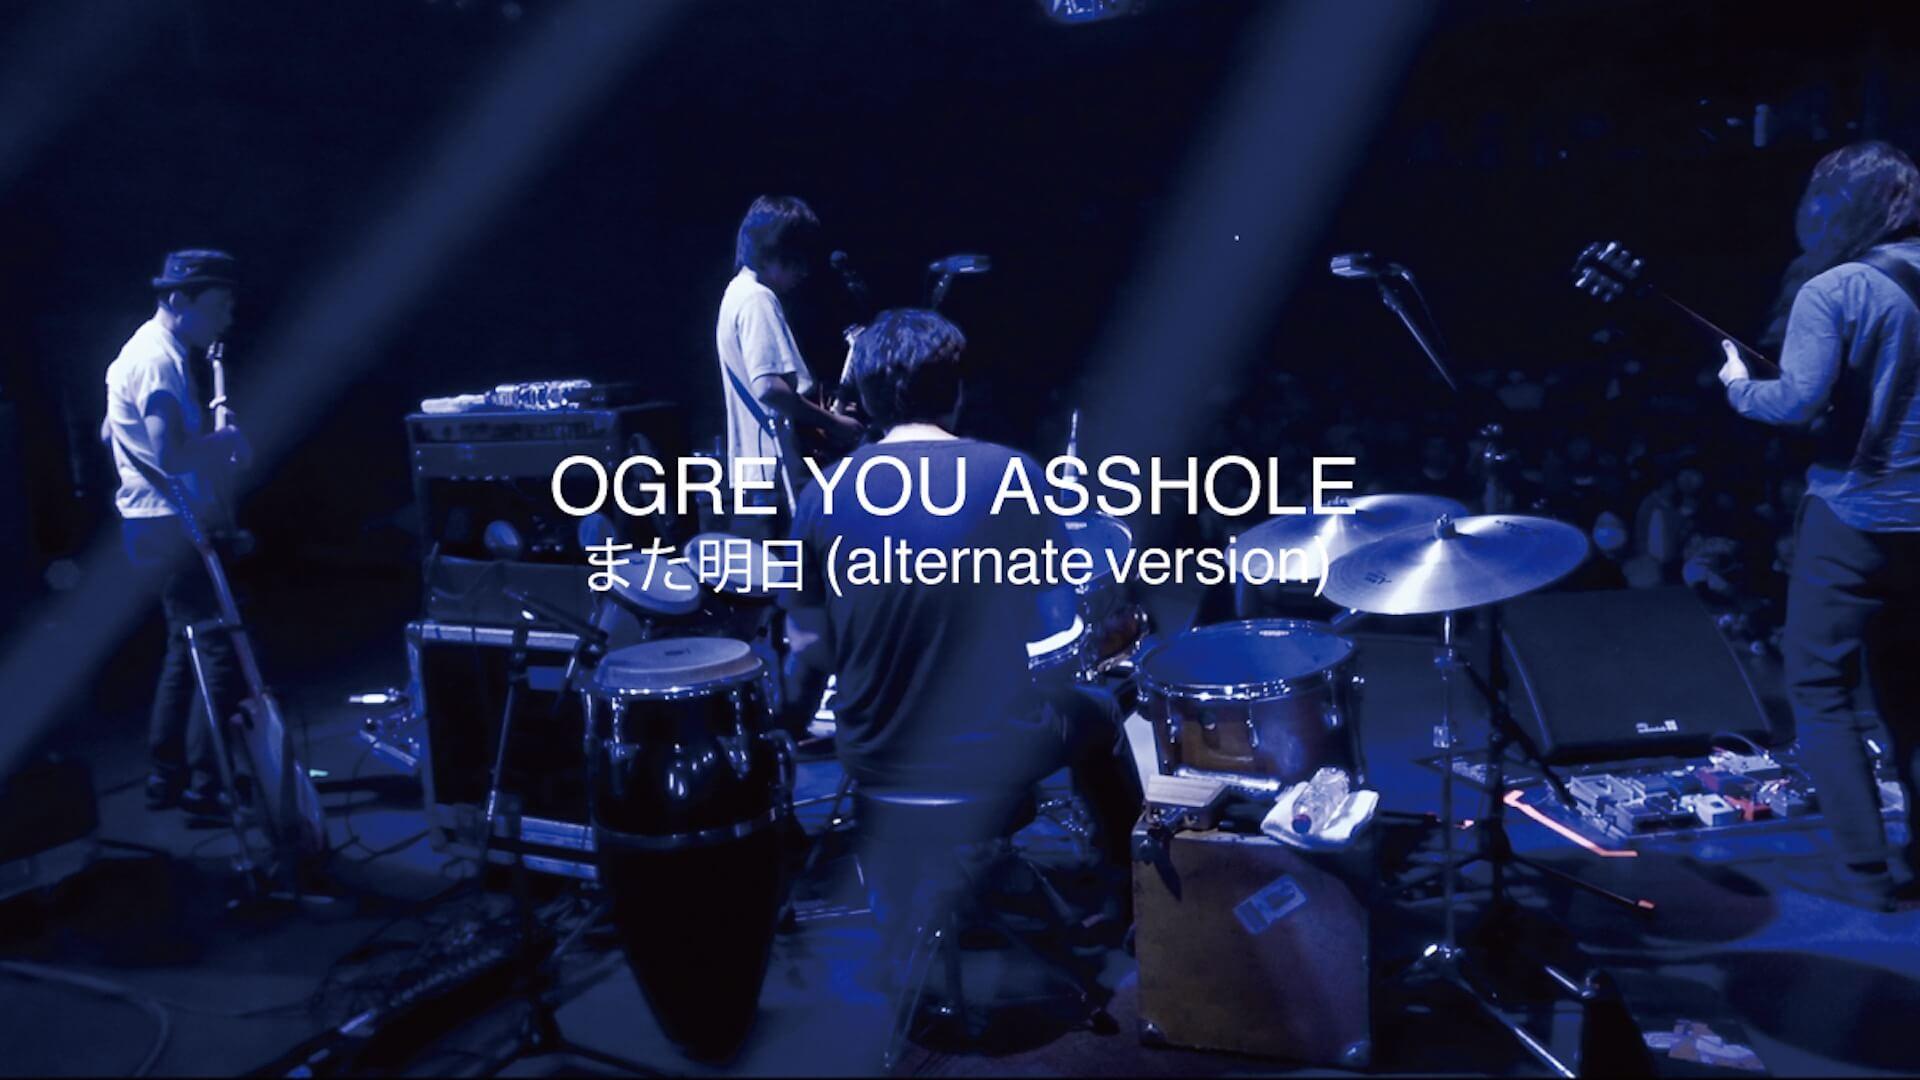 OGRE YOU ASSHOLEがホームのLIQUIDROOMにて、<Confidential>を開催決定|DJ・Yoshinori Hayashiが登場 music200317_ogreyouasshole_02